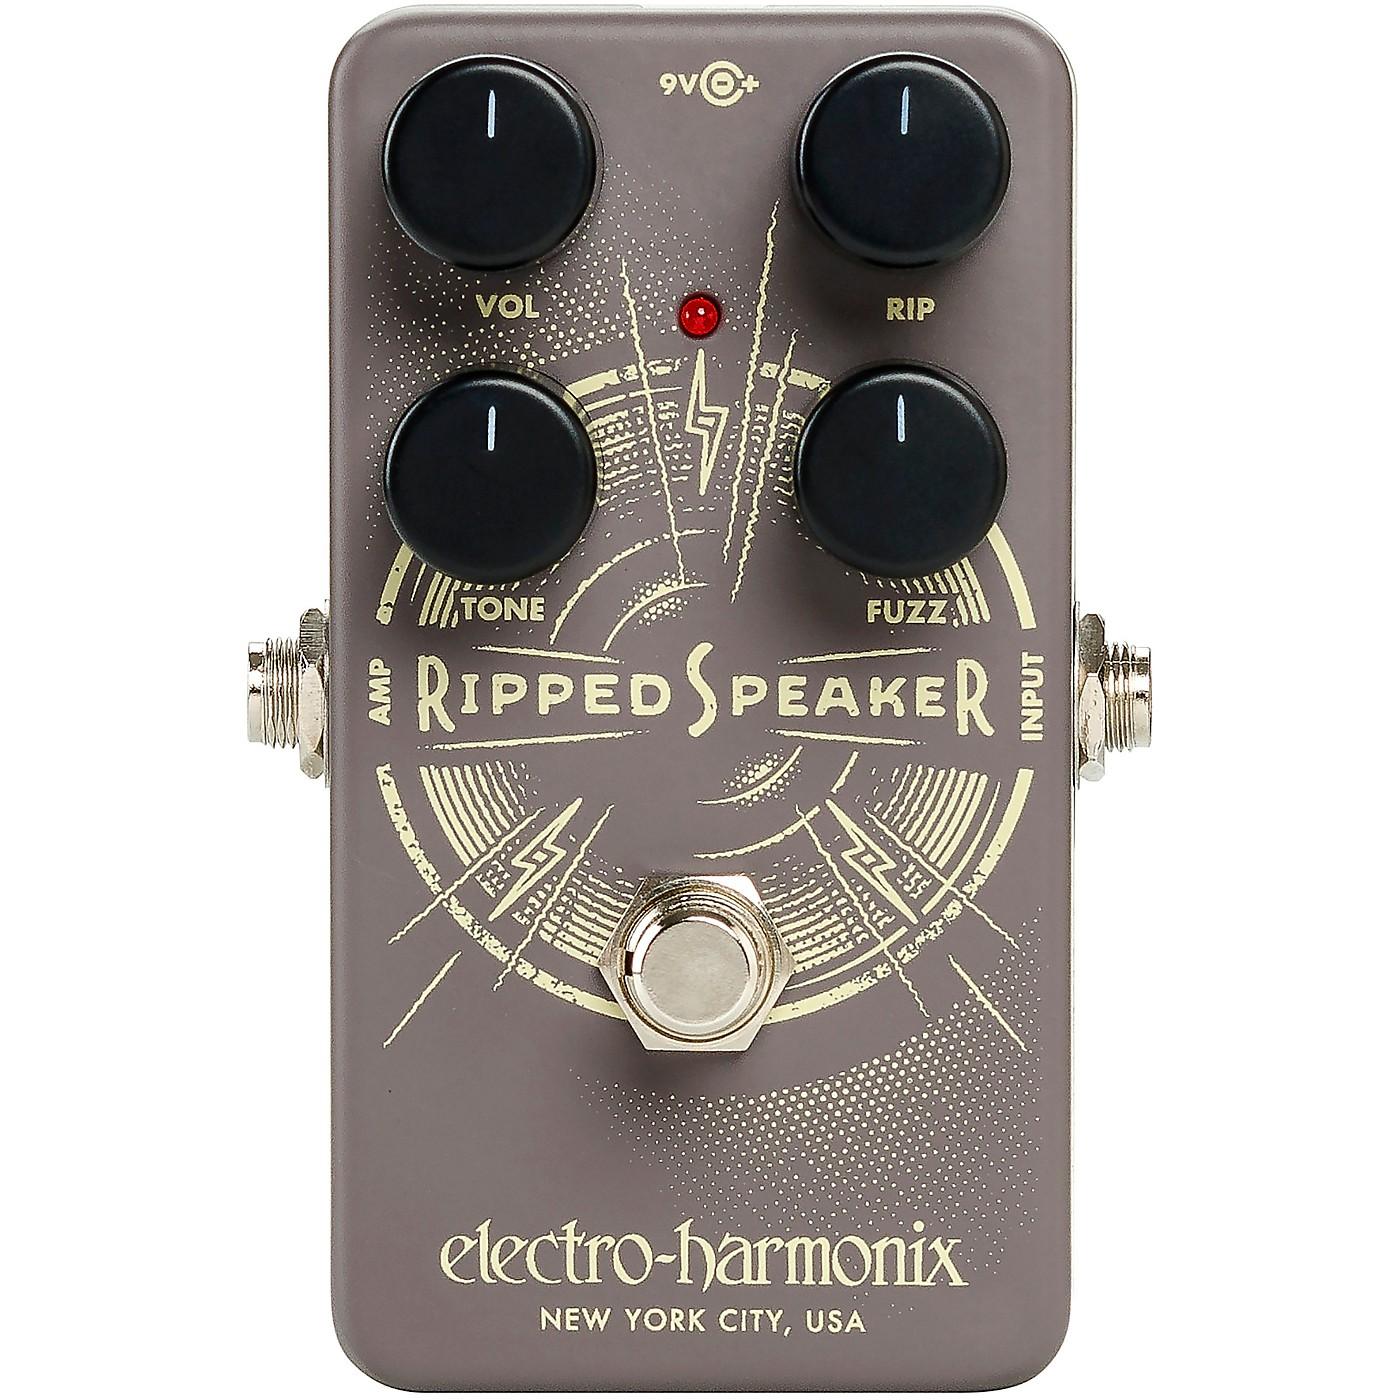 Electro-Harmonix Ripped Speaker Fuzz Effects Pedal thumbnail